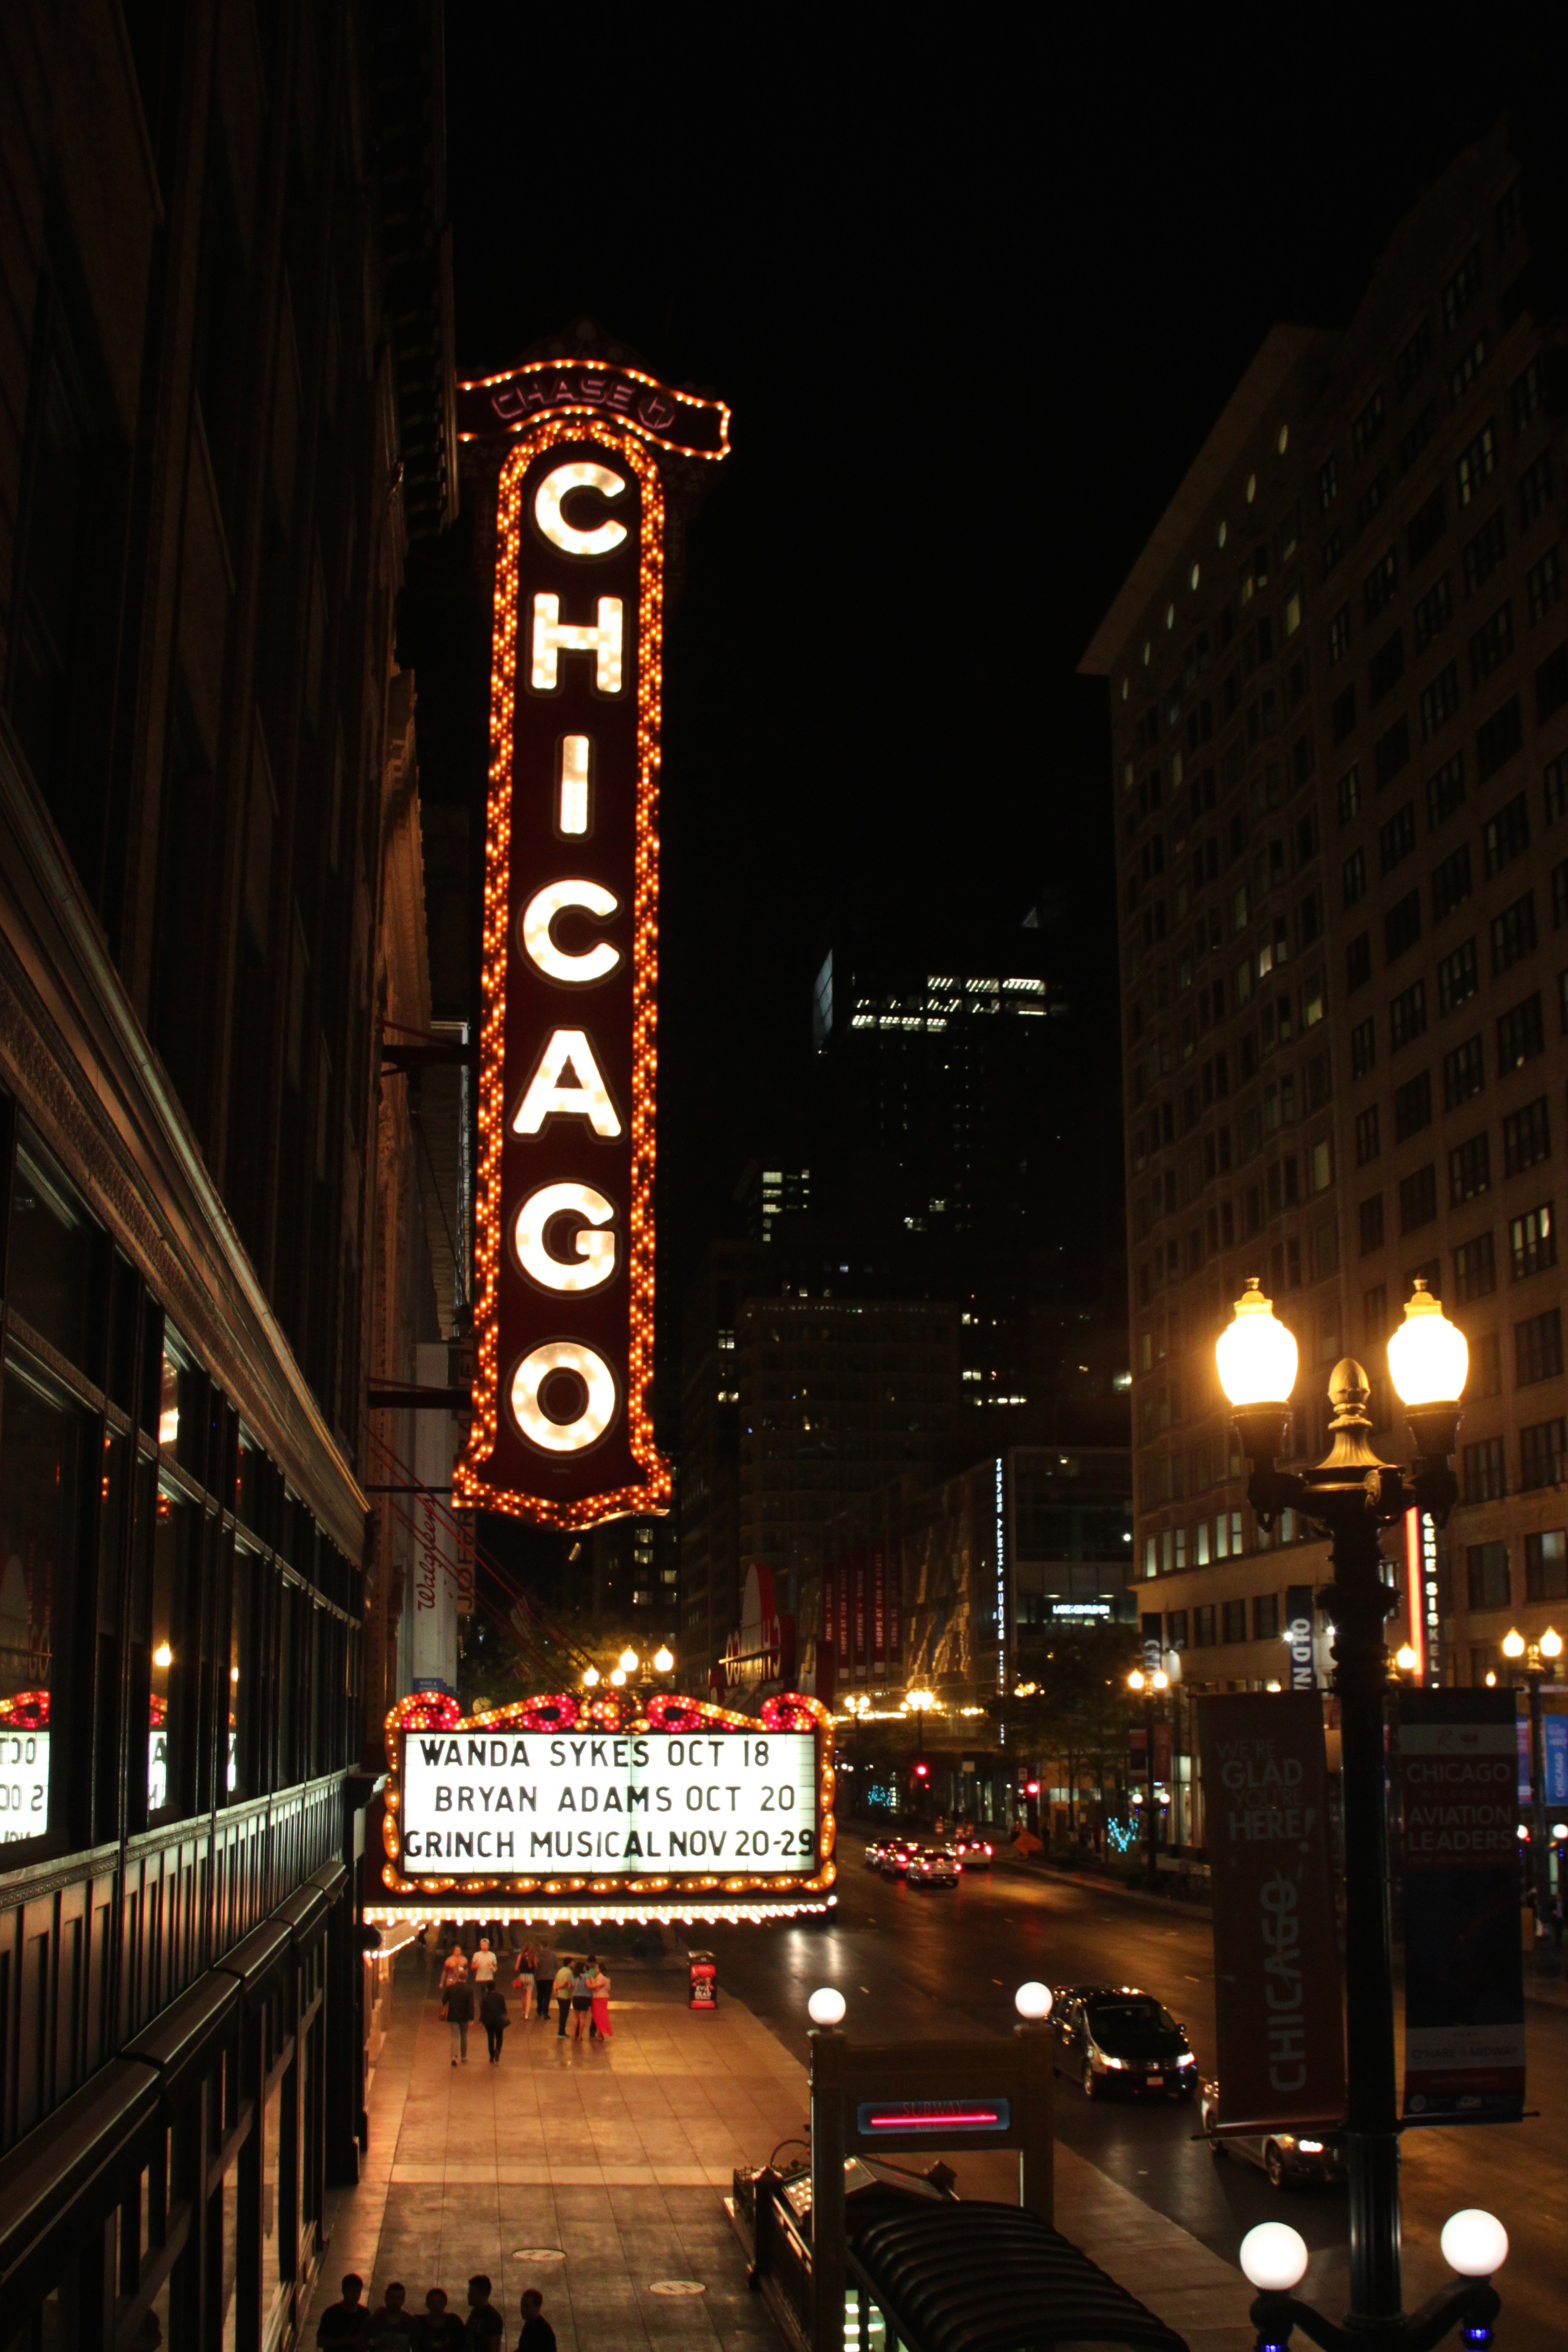 chicagonight